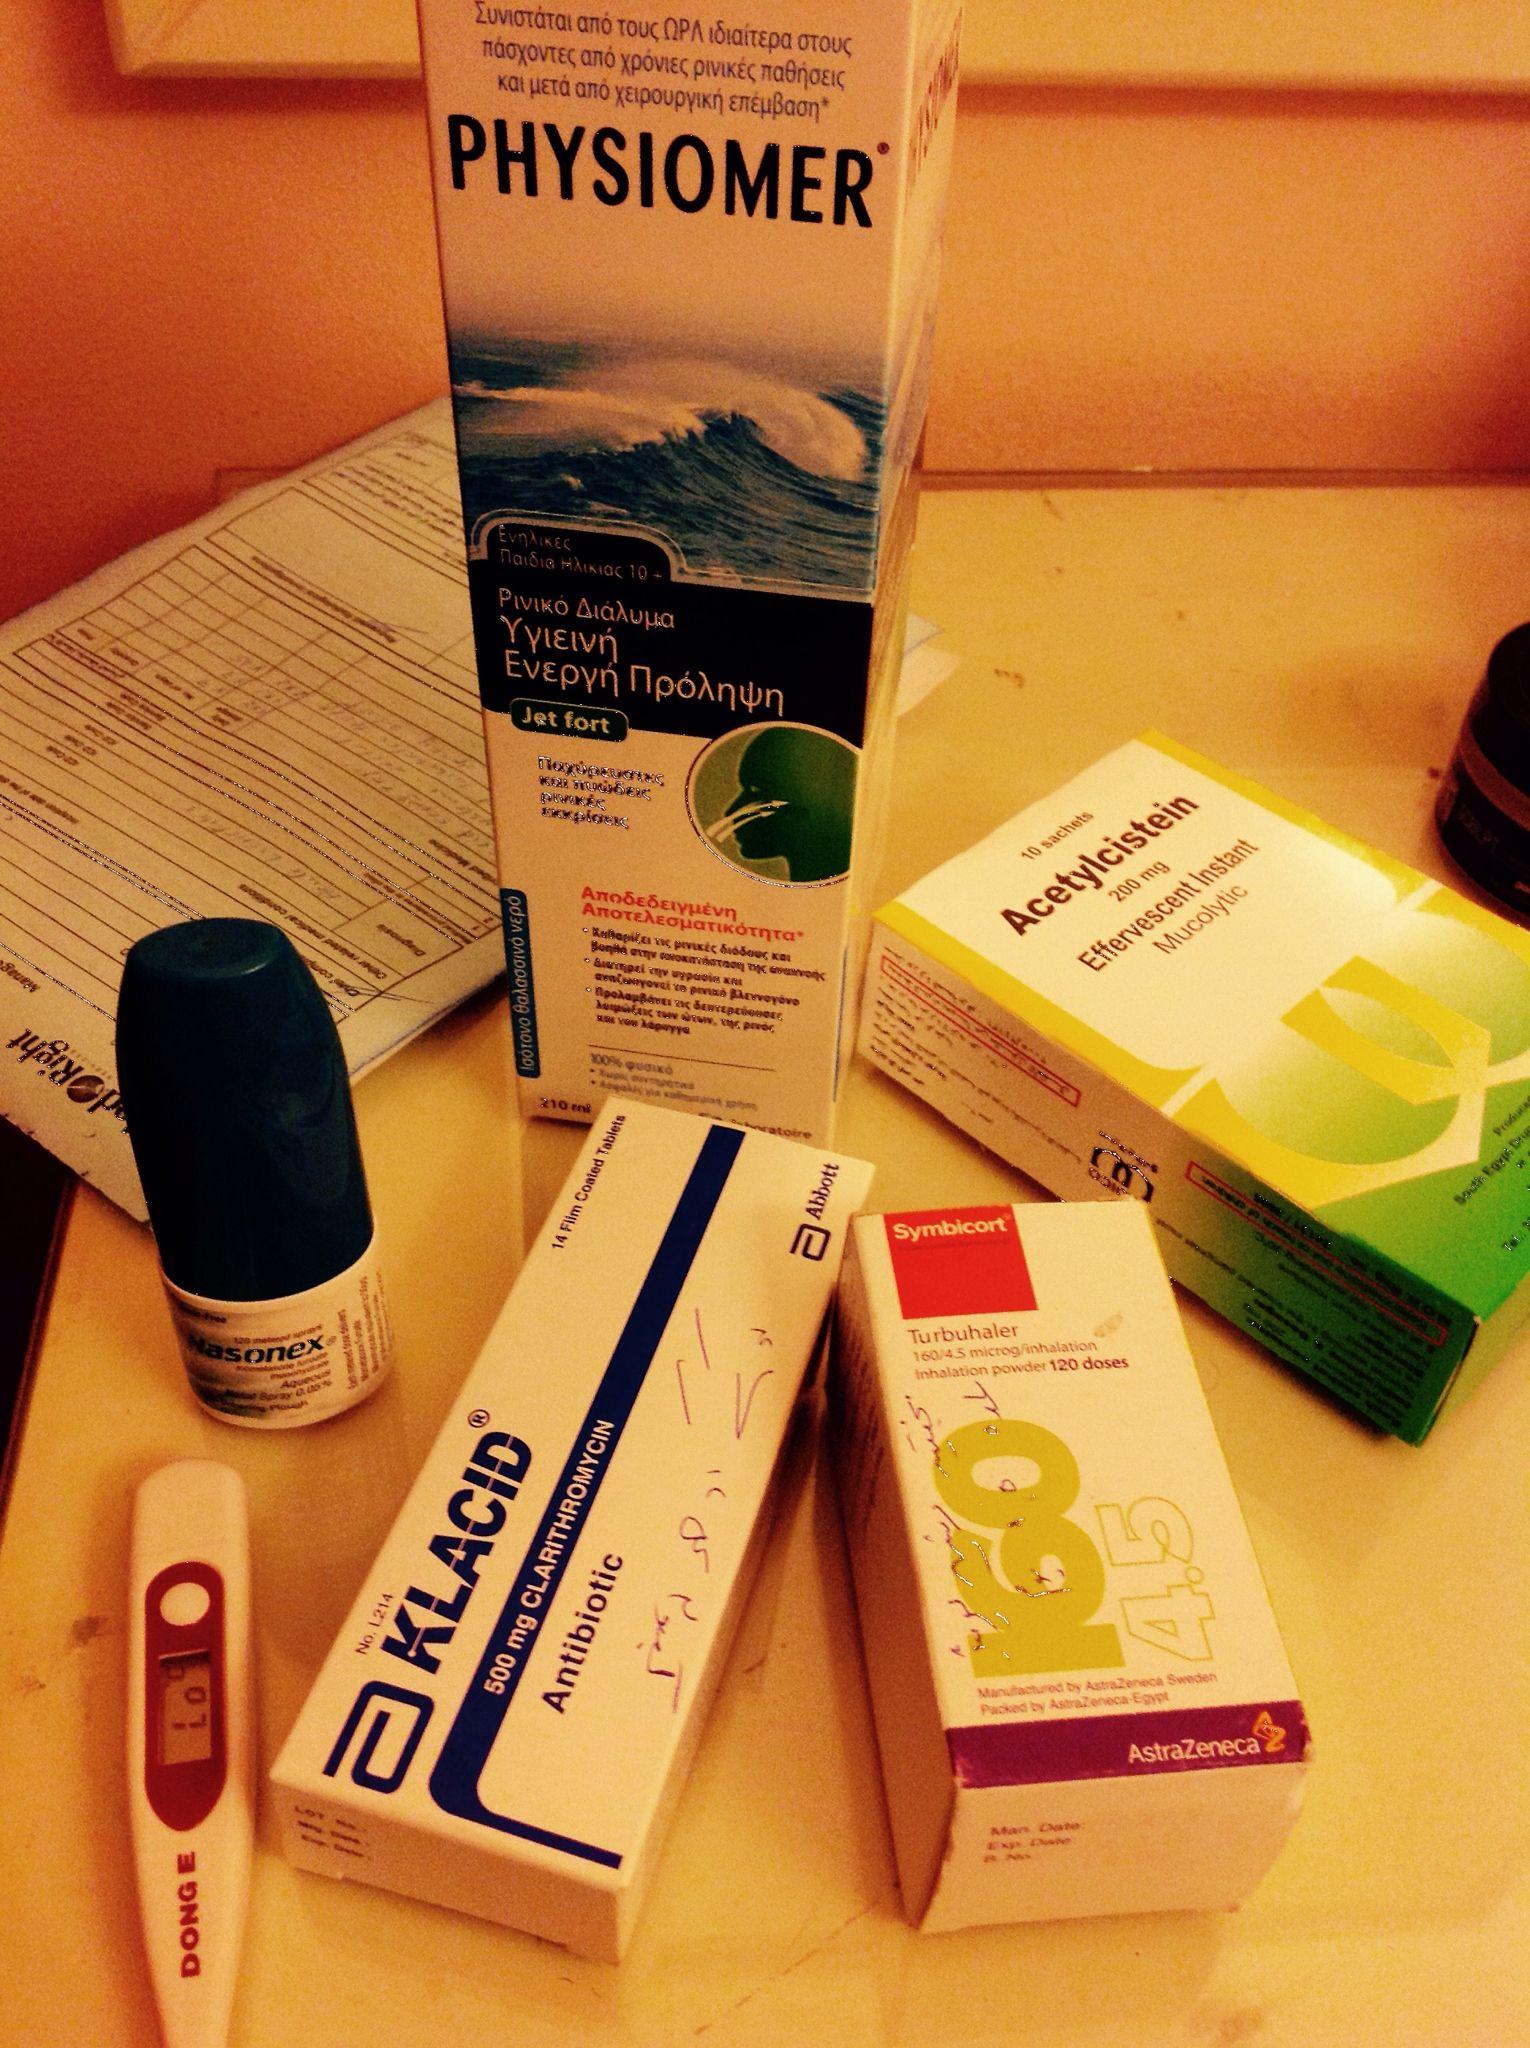 After Soar Throat Gum Antibiotic Opa